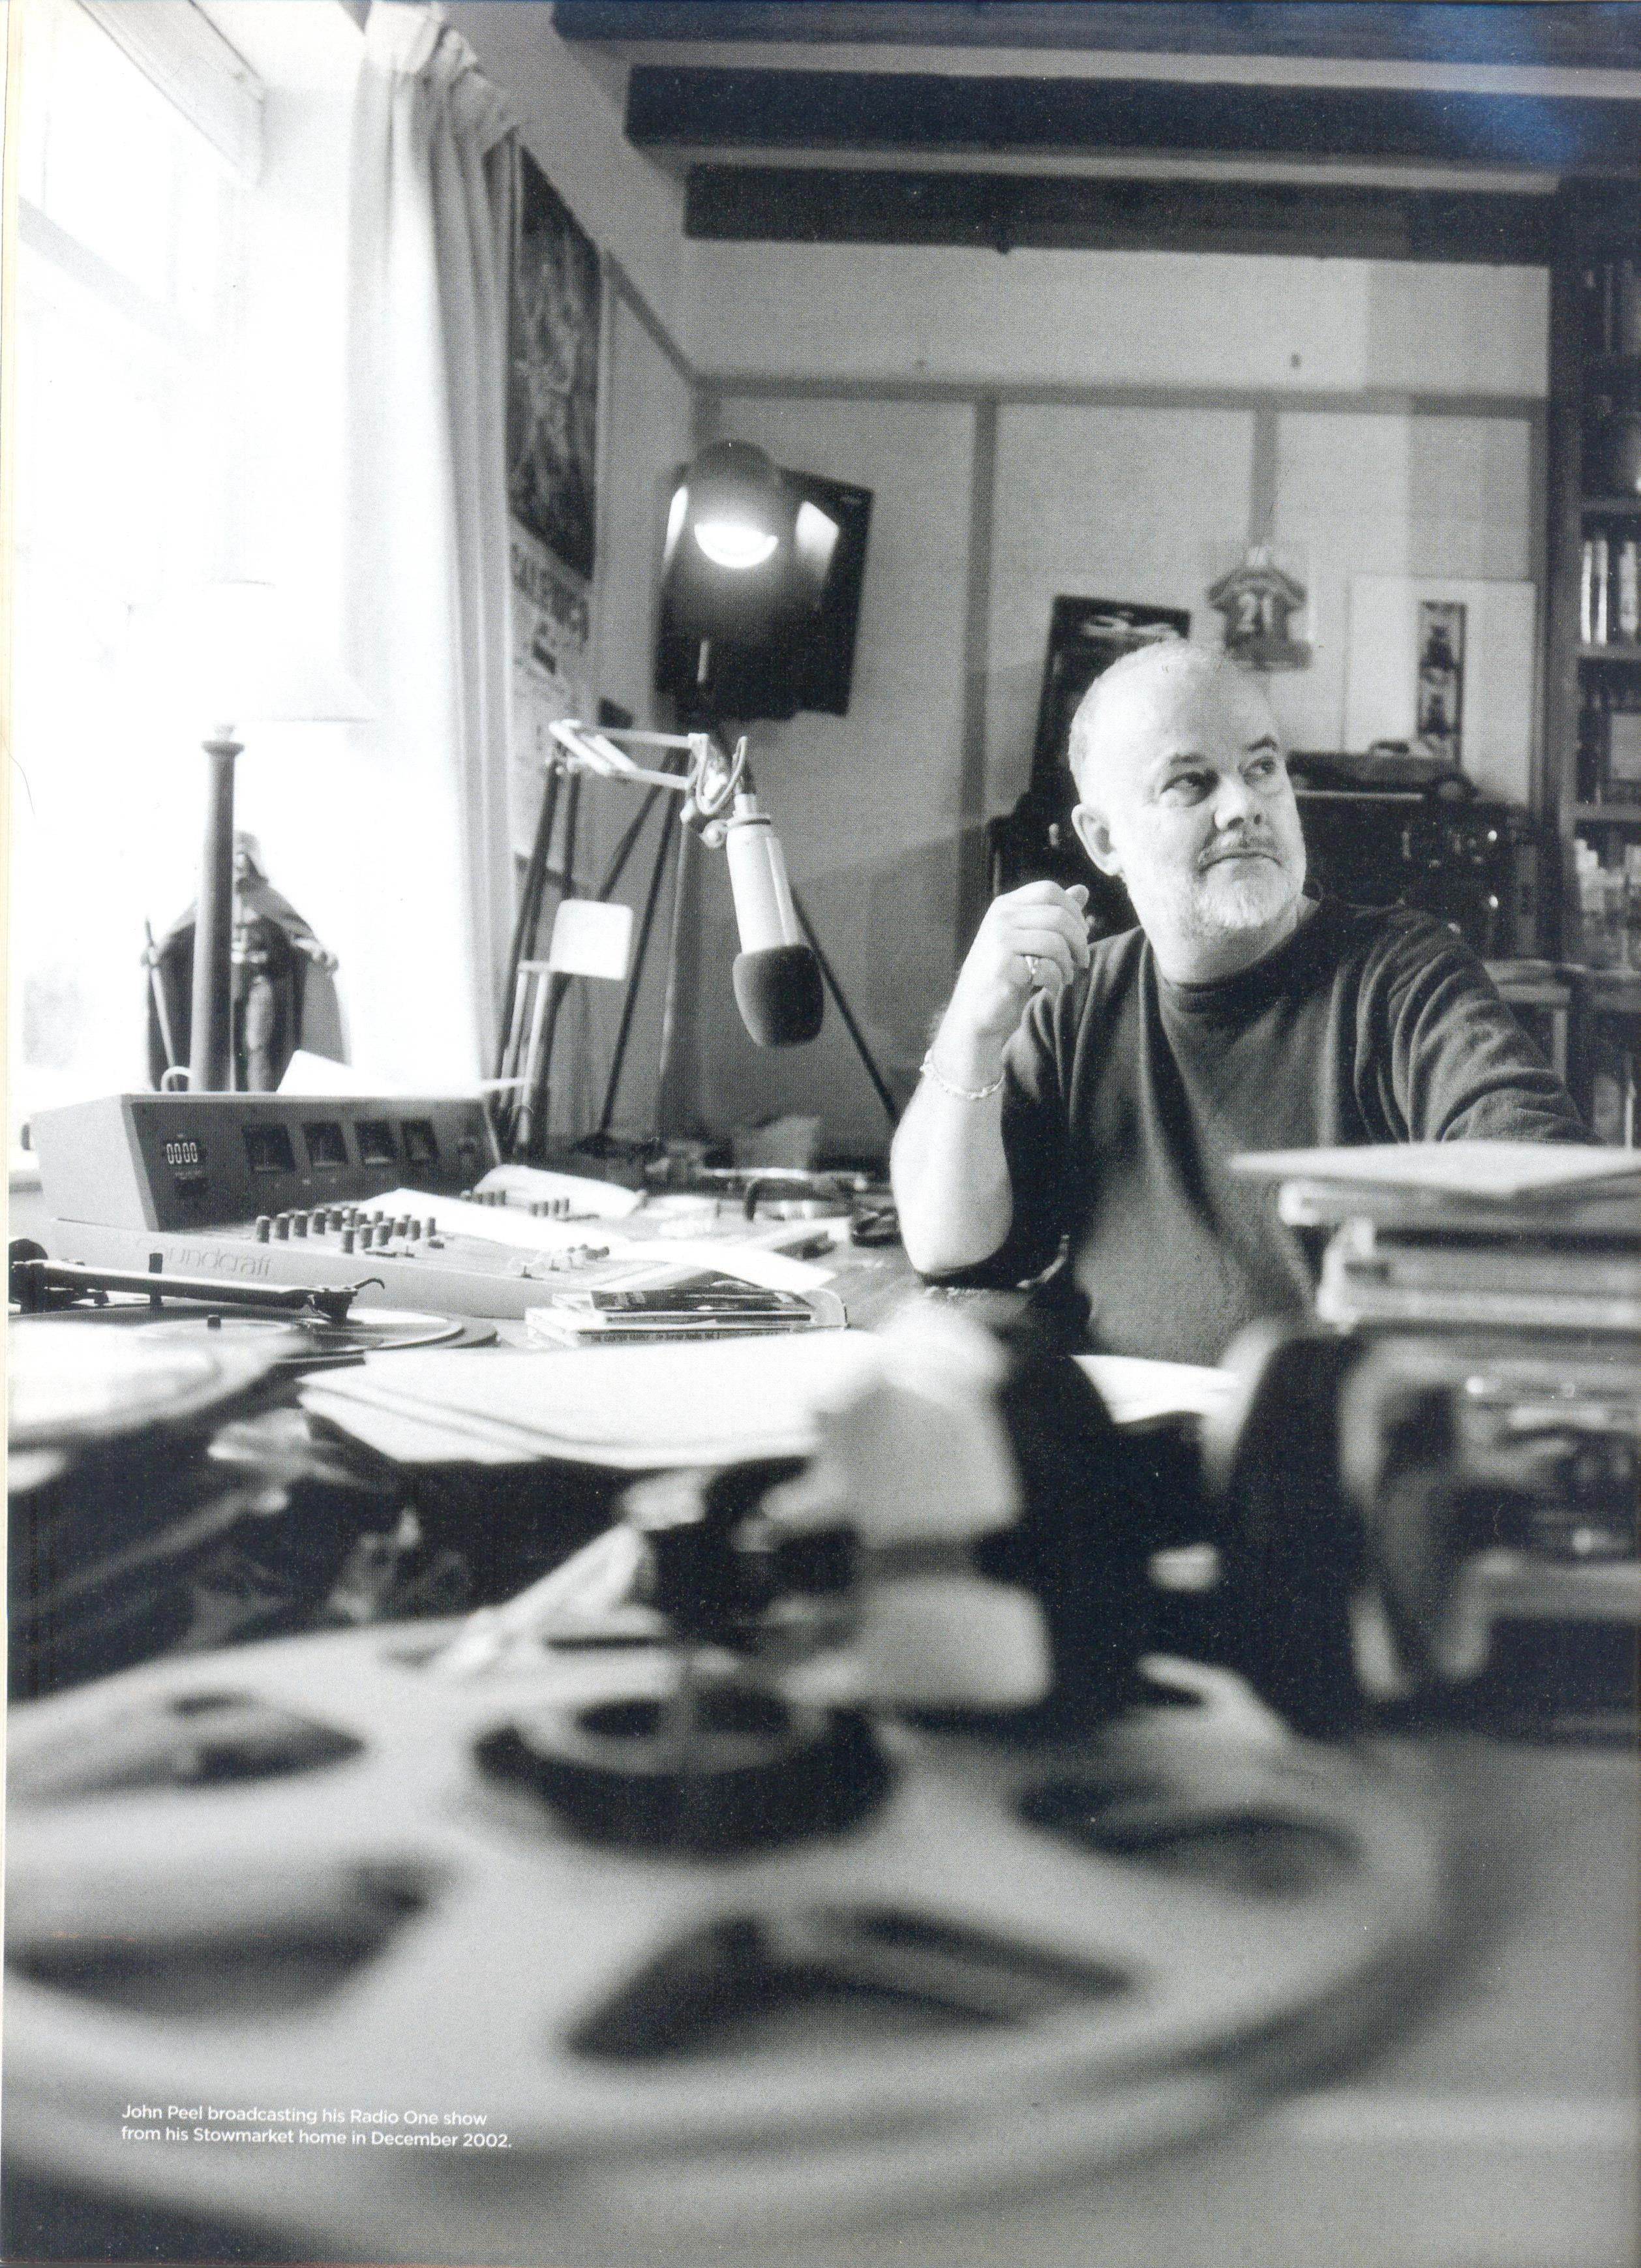 john peel home studio